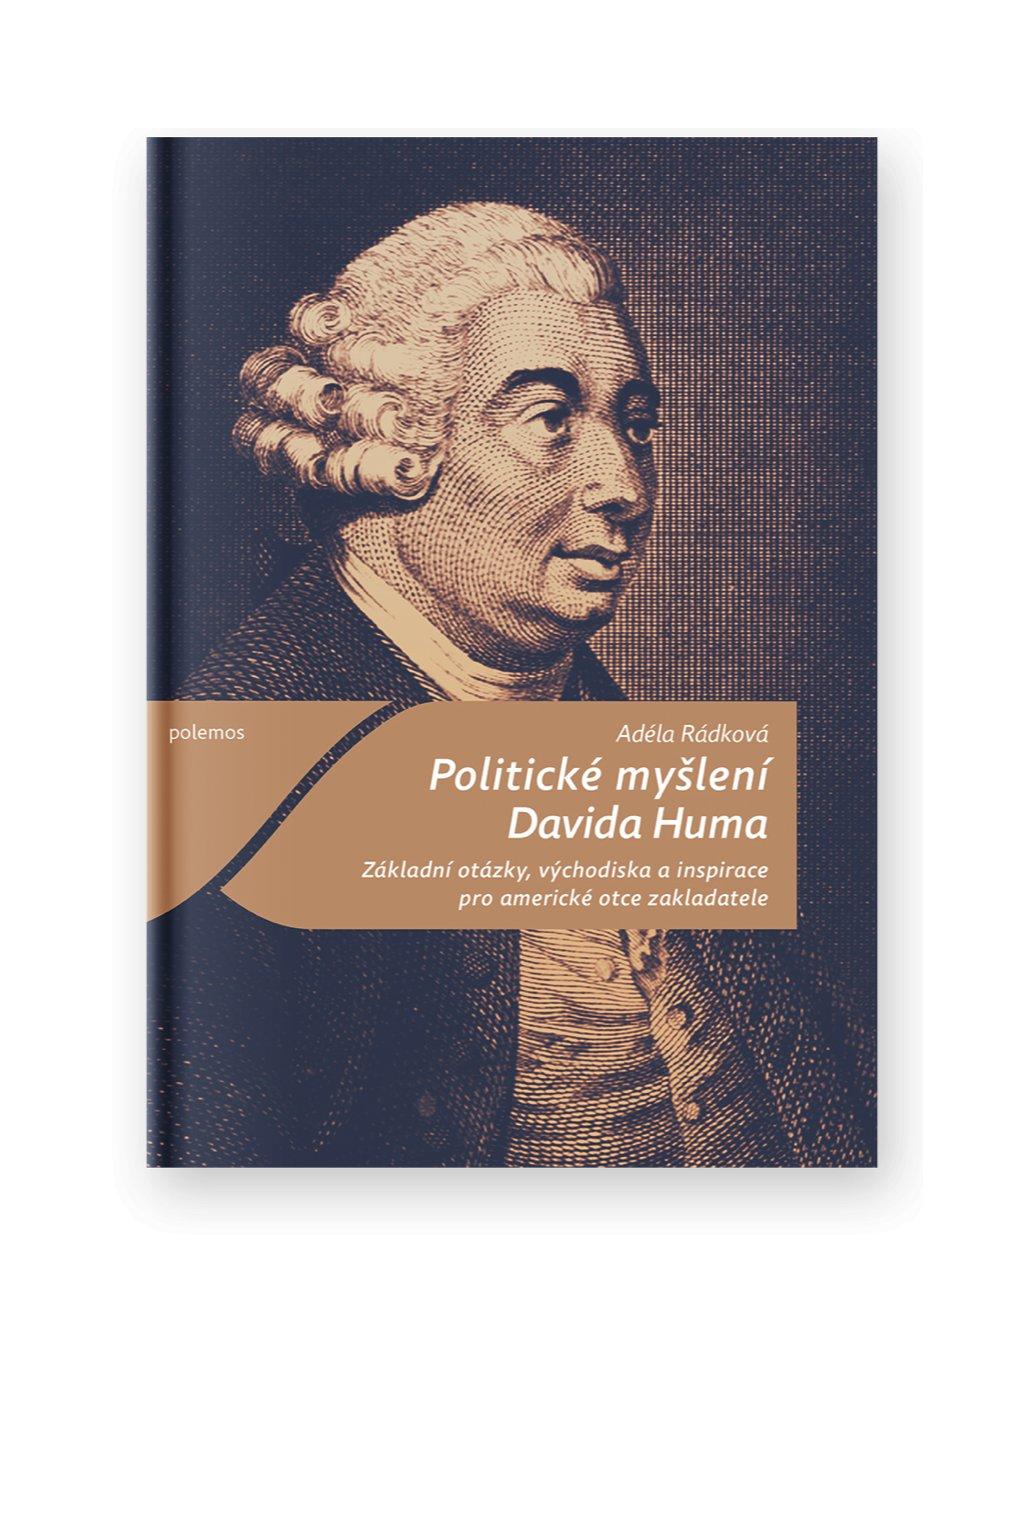 1304 politicke mysleni davida huma zakladni otazky vychodiska a inspirace pro americke otce zakladatele